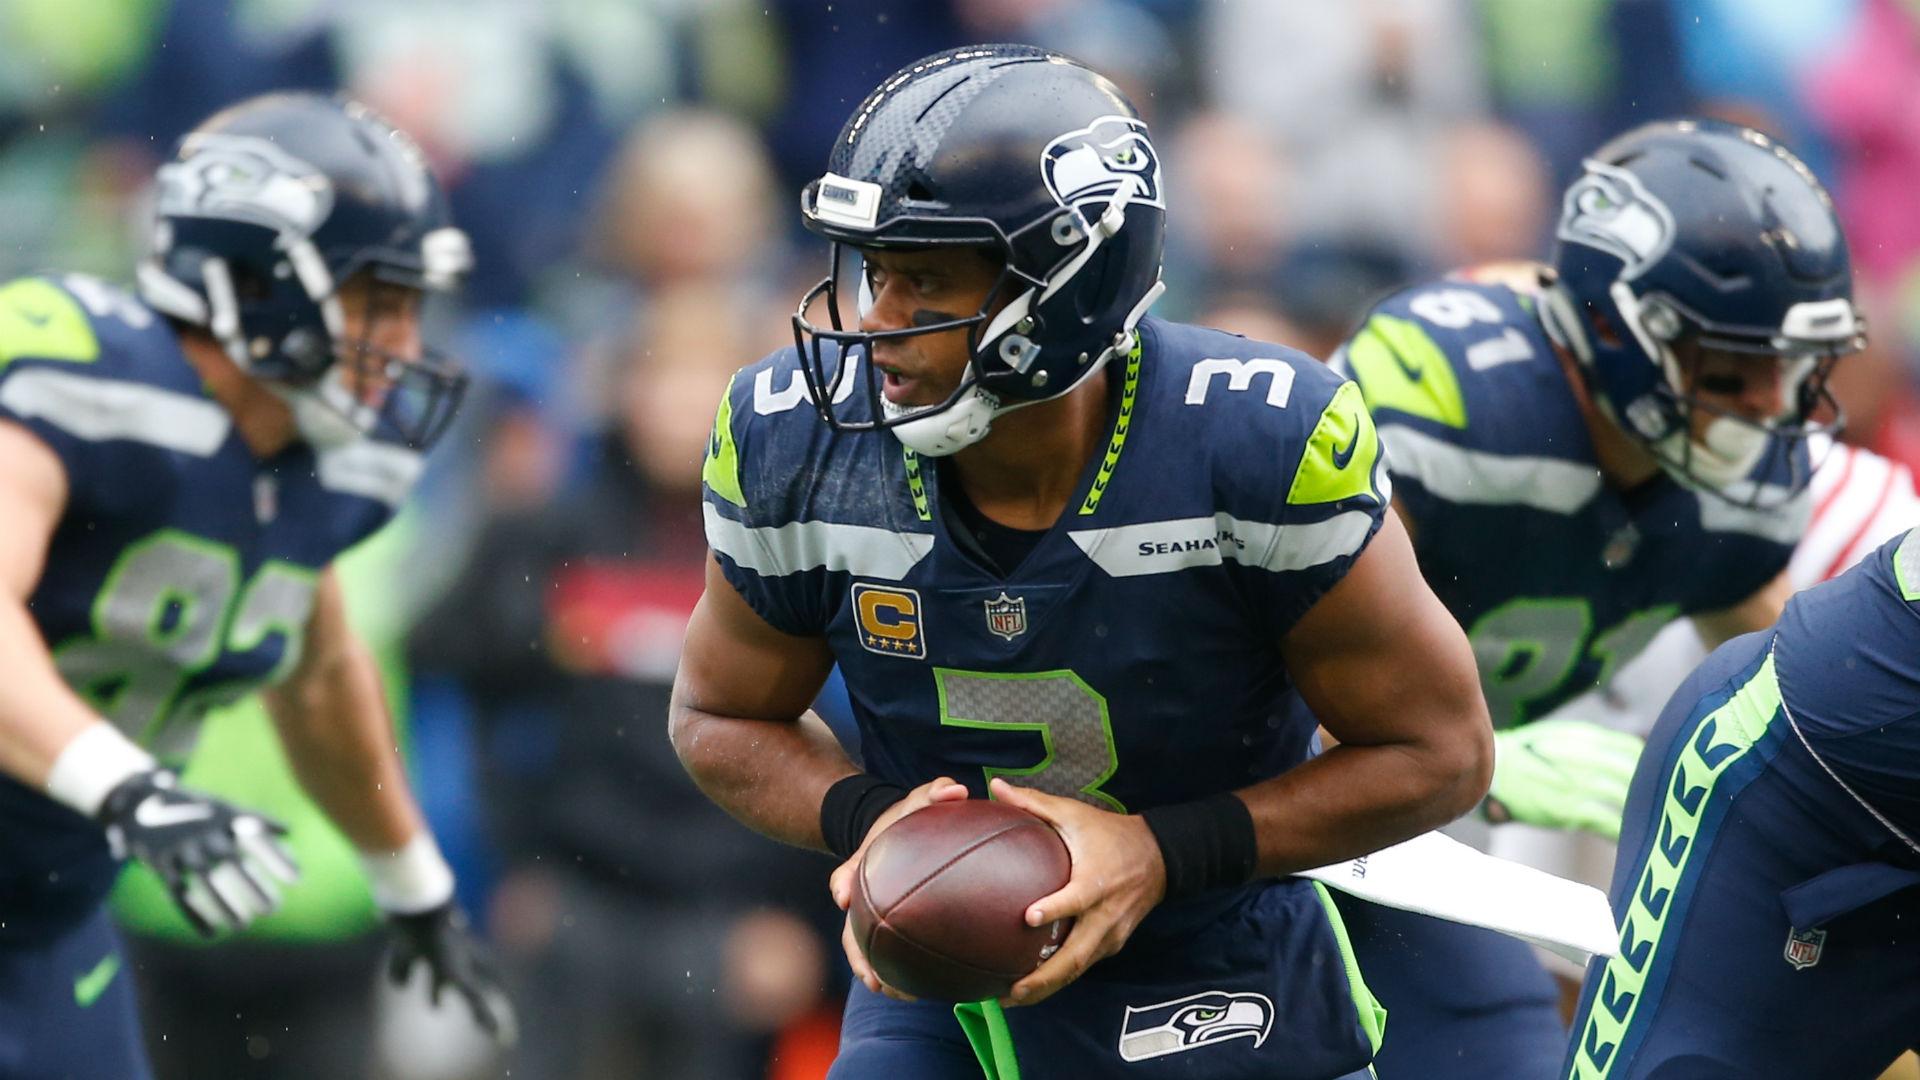 Week 9 NFL picks against spread: Seahawks rout Redskins; Jets upend Bills